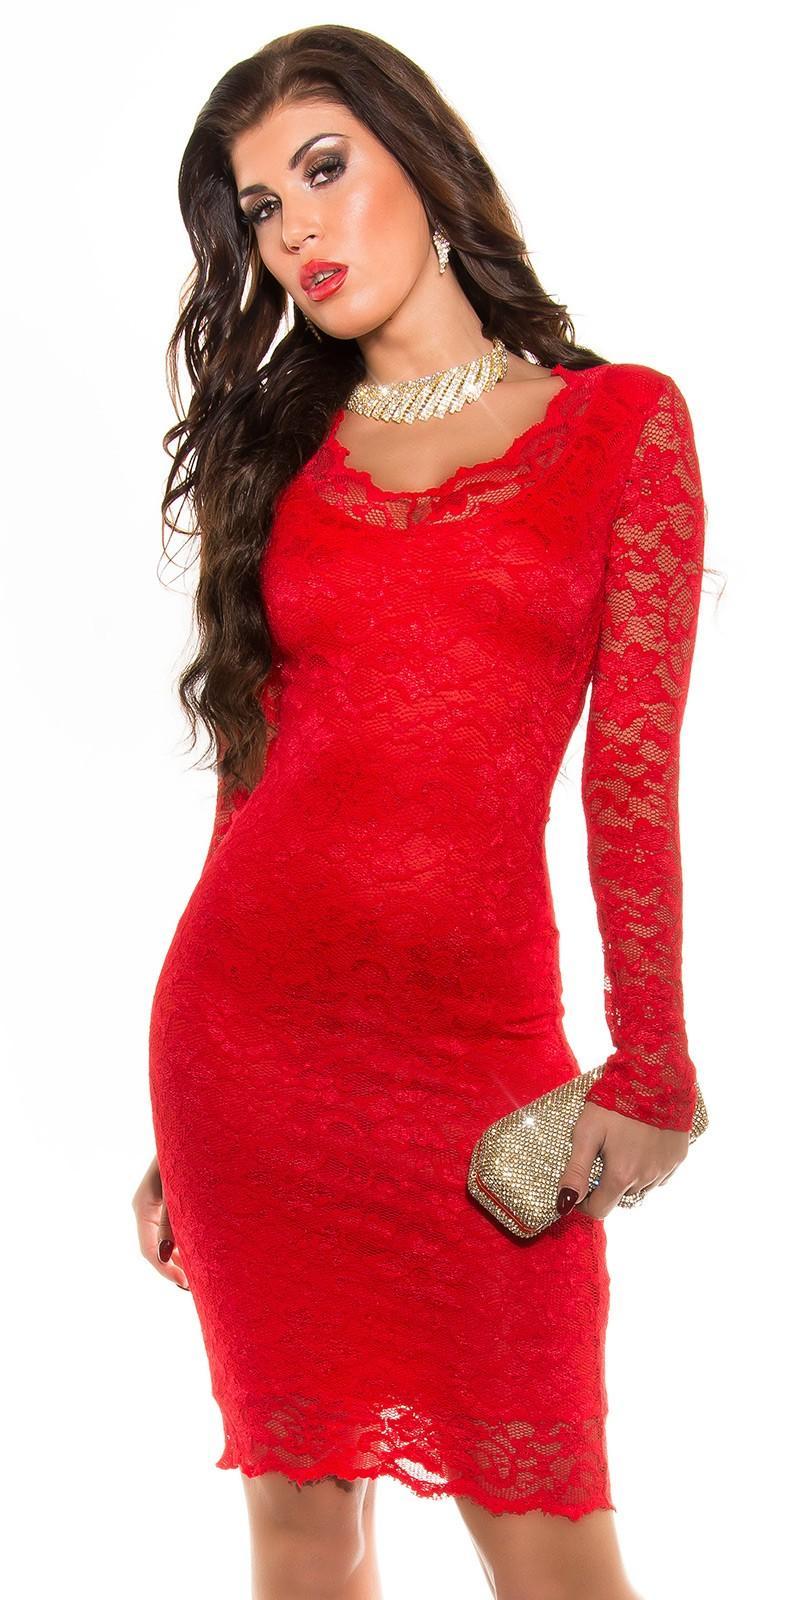 Vestido de fiesta rojo de encaje chic